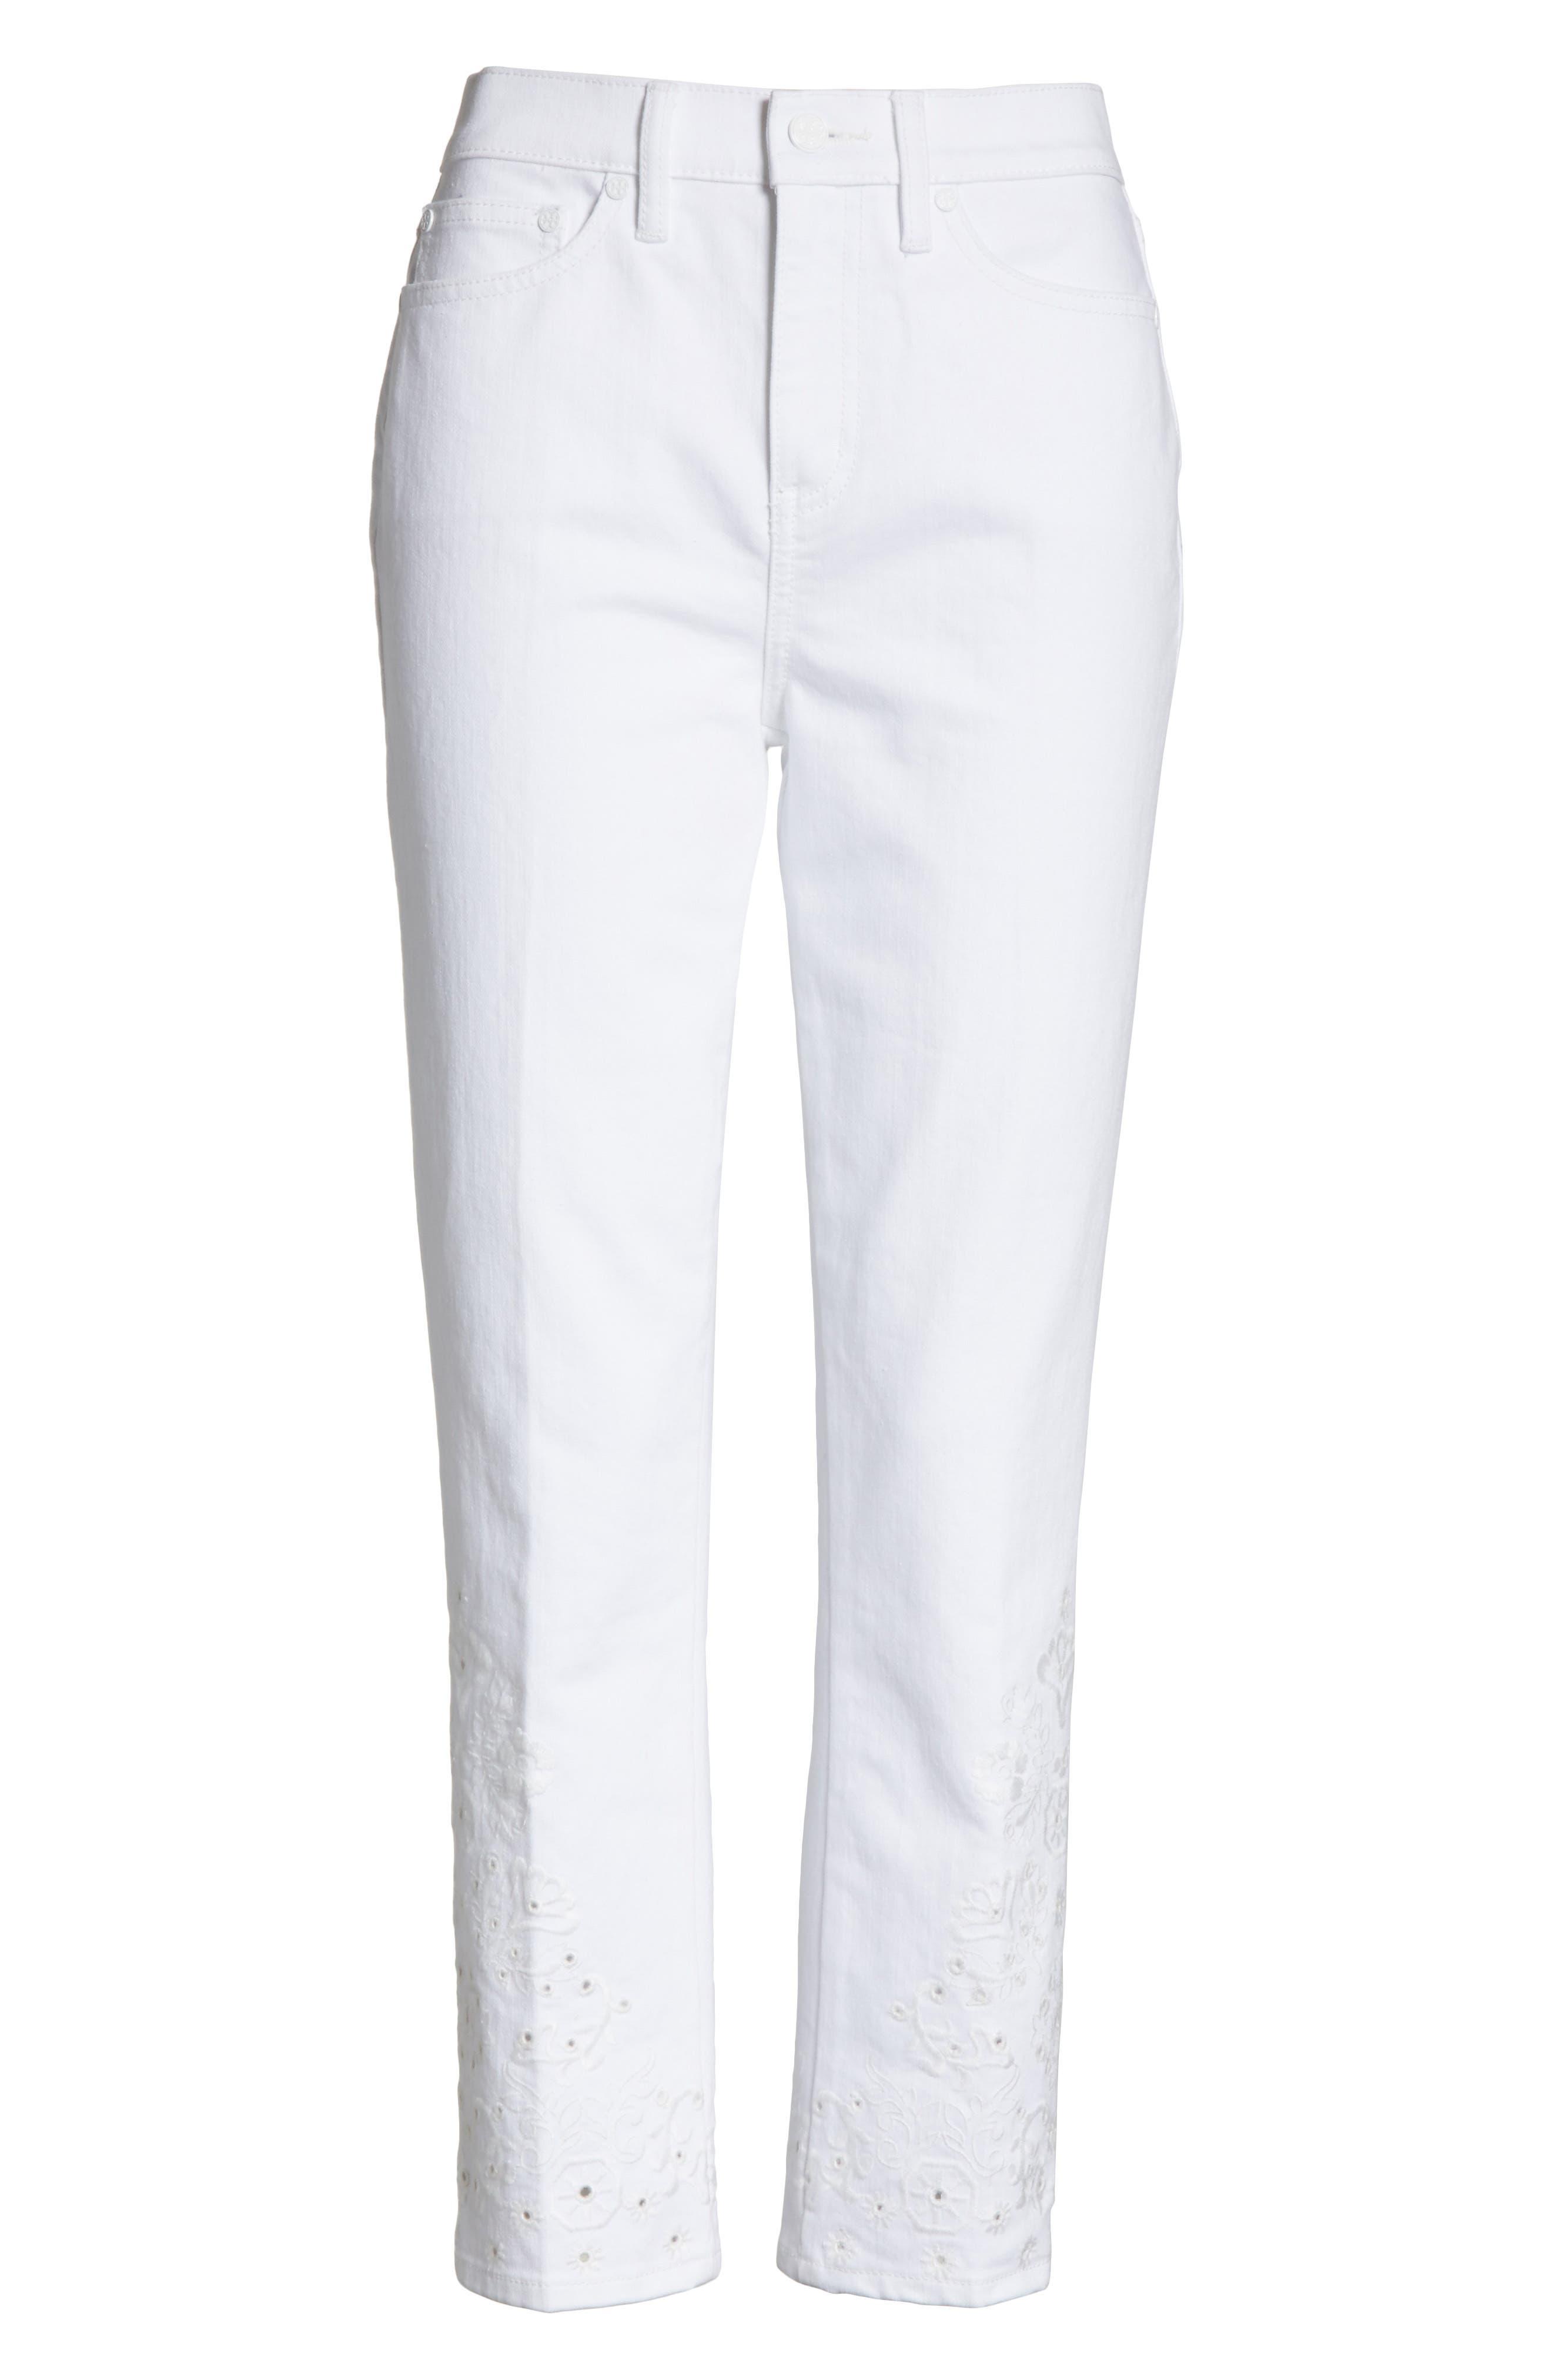 Keira Eyelet Hem Crop Jeans,                             Alternate thumbnail 6, color,                             Rinse Wash